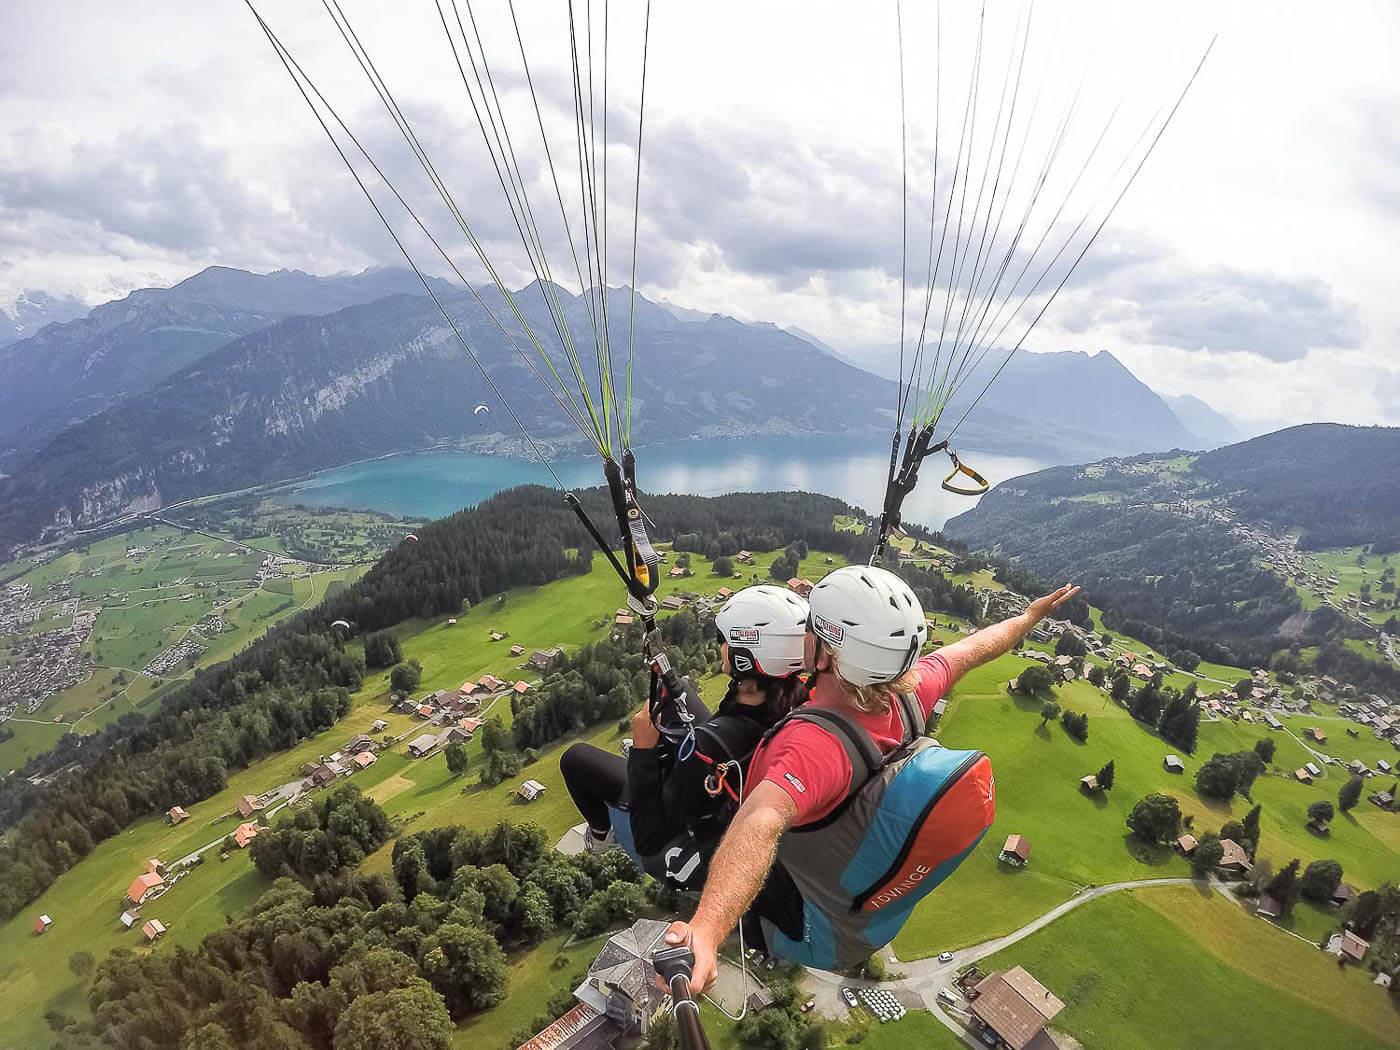 Viagem para Suíça - Turismo para Suíça - Interlaken